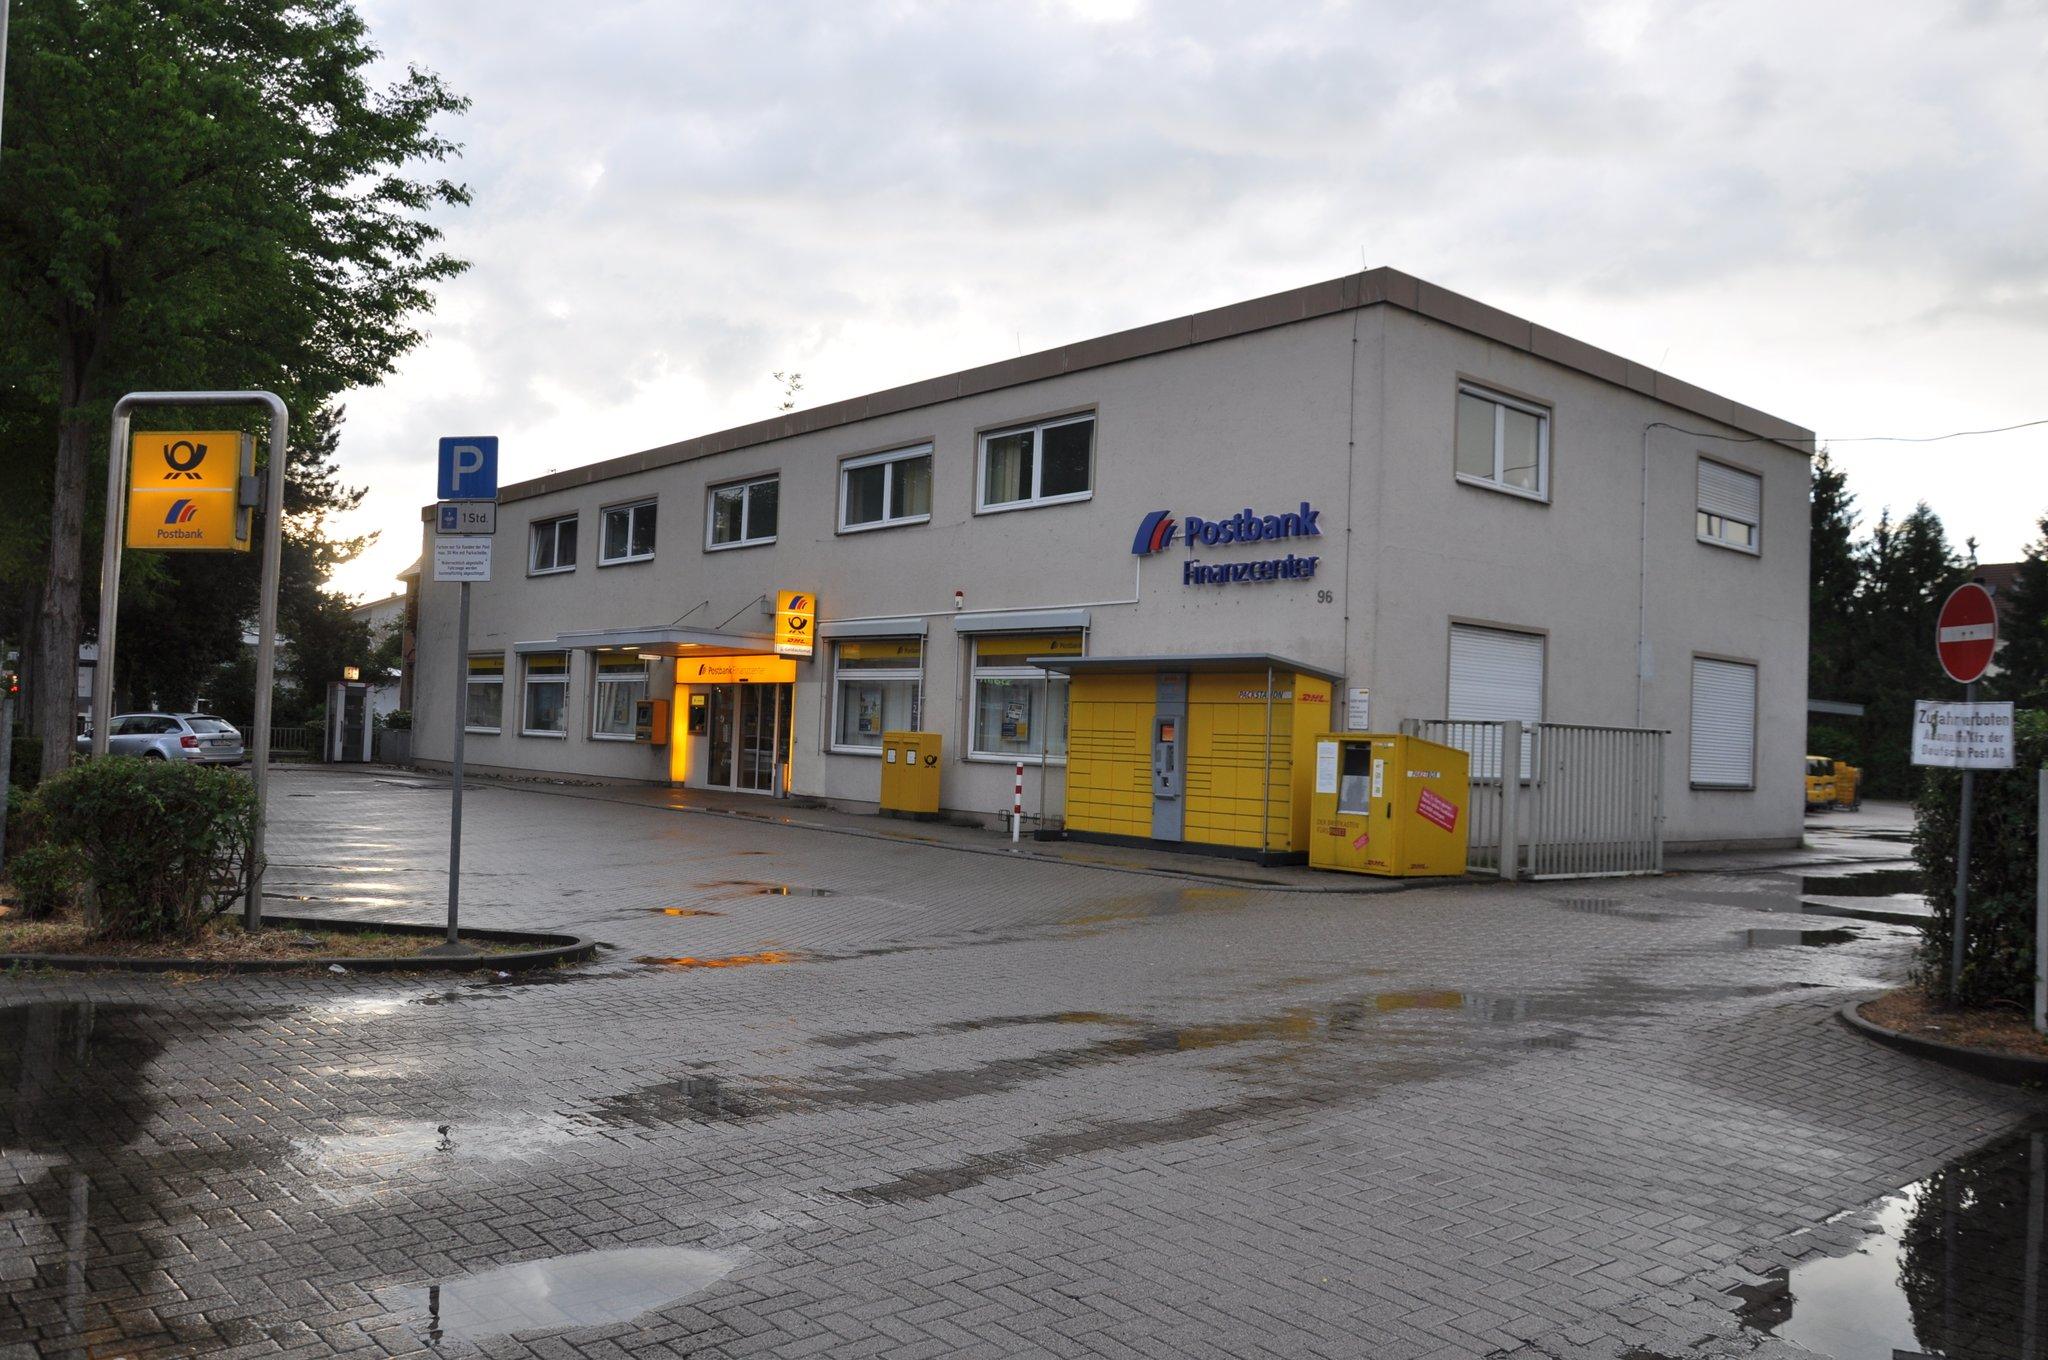 Postbank Bruchsal